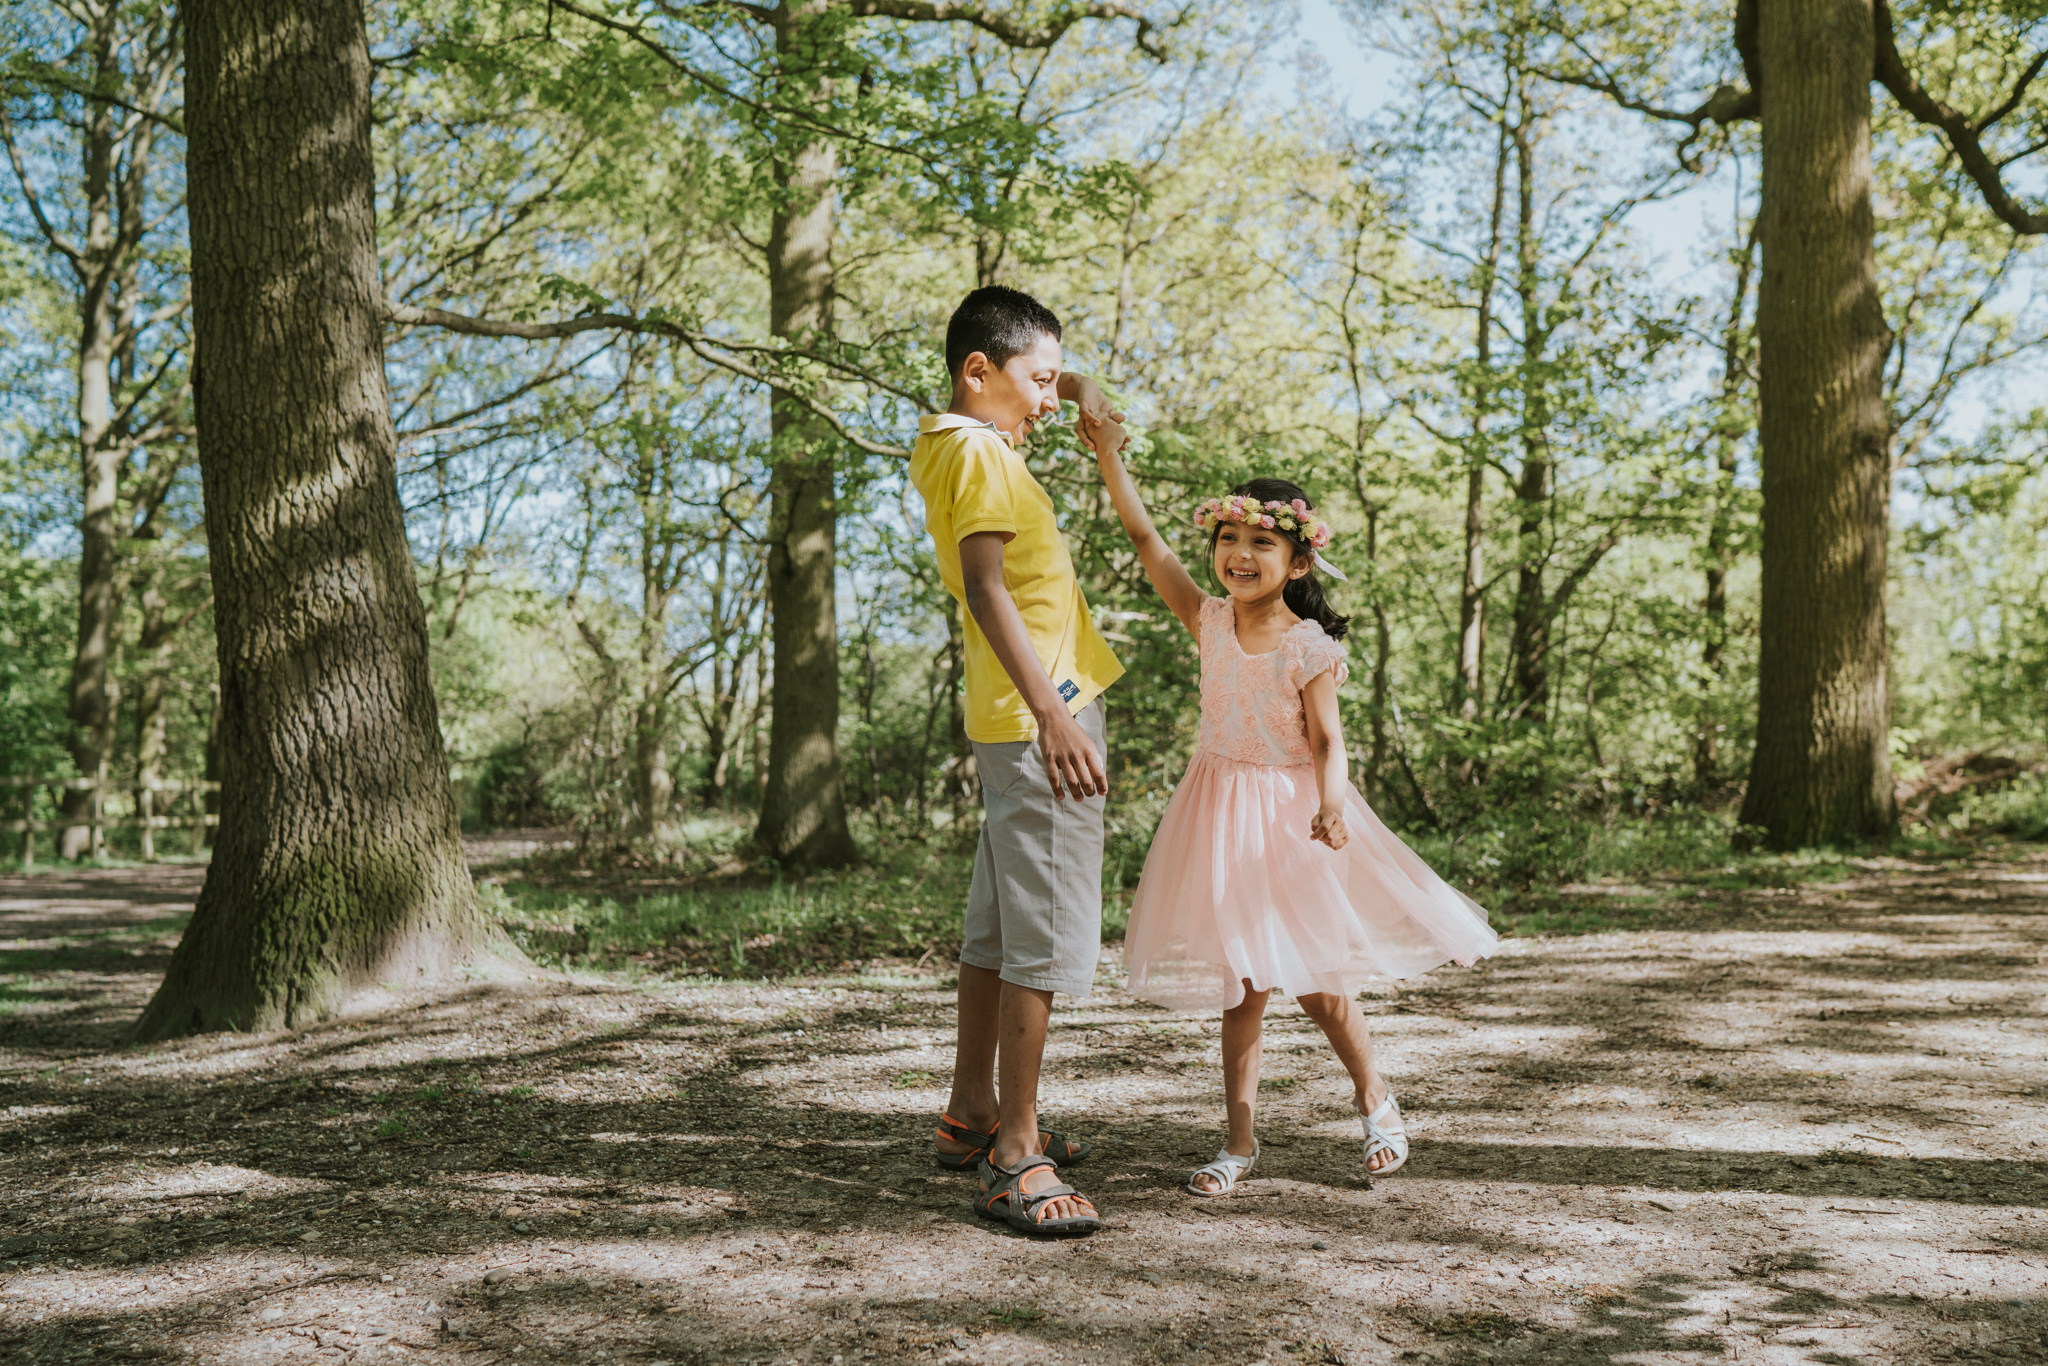 Chandrasiri-Family-Session-Woodland-Colchester-Essex-Grace-Elizabeth-Alternative-Wedding-Photographer (1 of 1).jpg (17 of 34).jpg